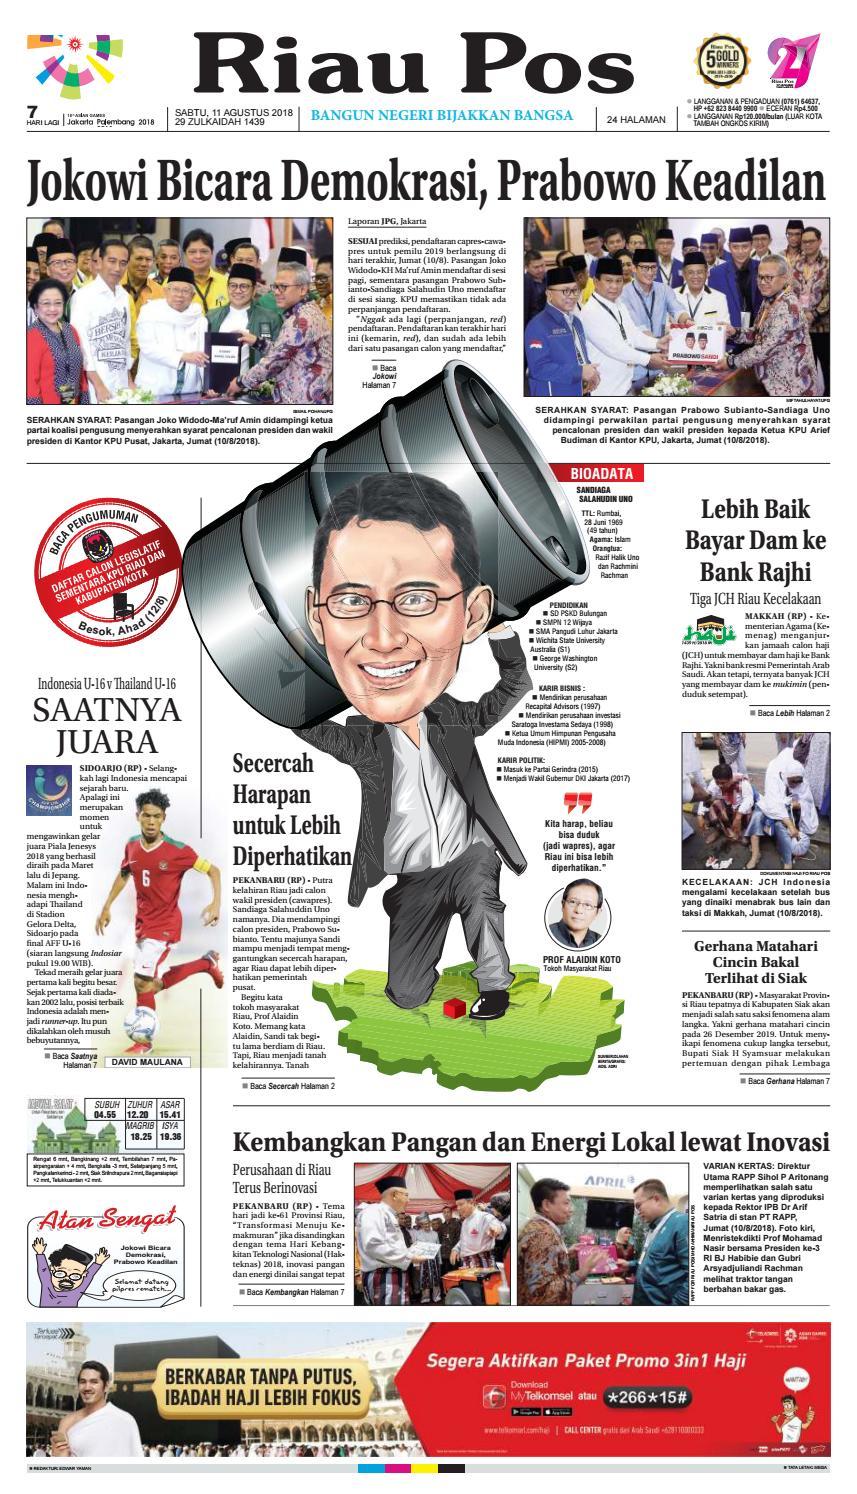 Riau Pos Edisi Sabtu 2018 08 11 By Issuu Produk Ukm Bumn Atasan Tenun Pria Lengan Pendek Hijau B